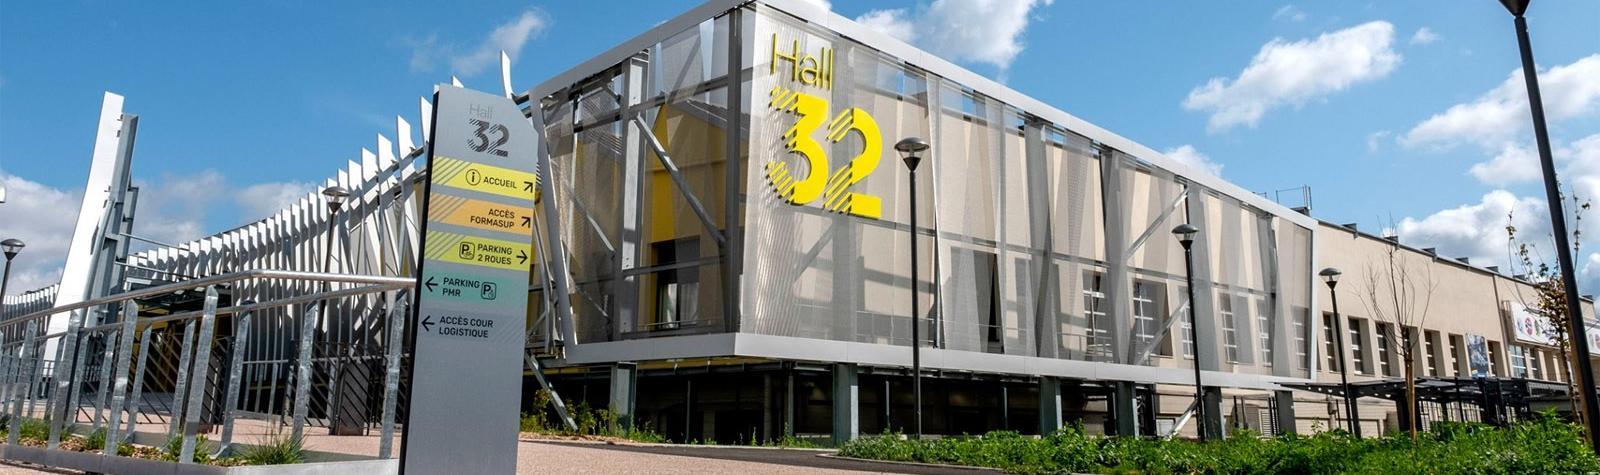 hal32